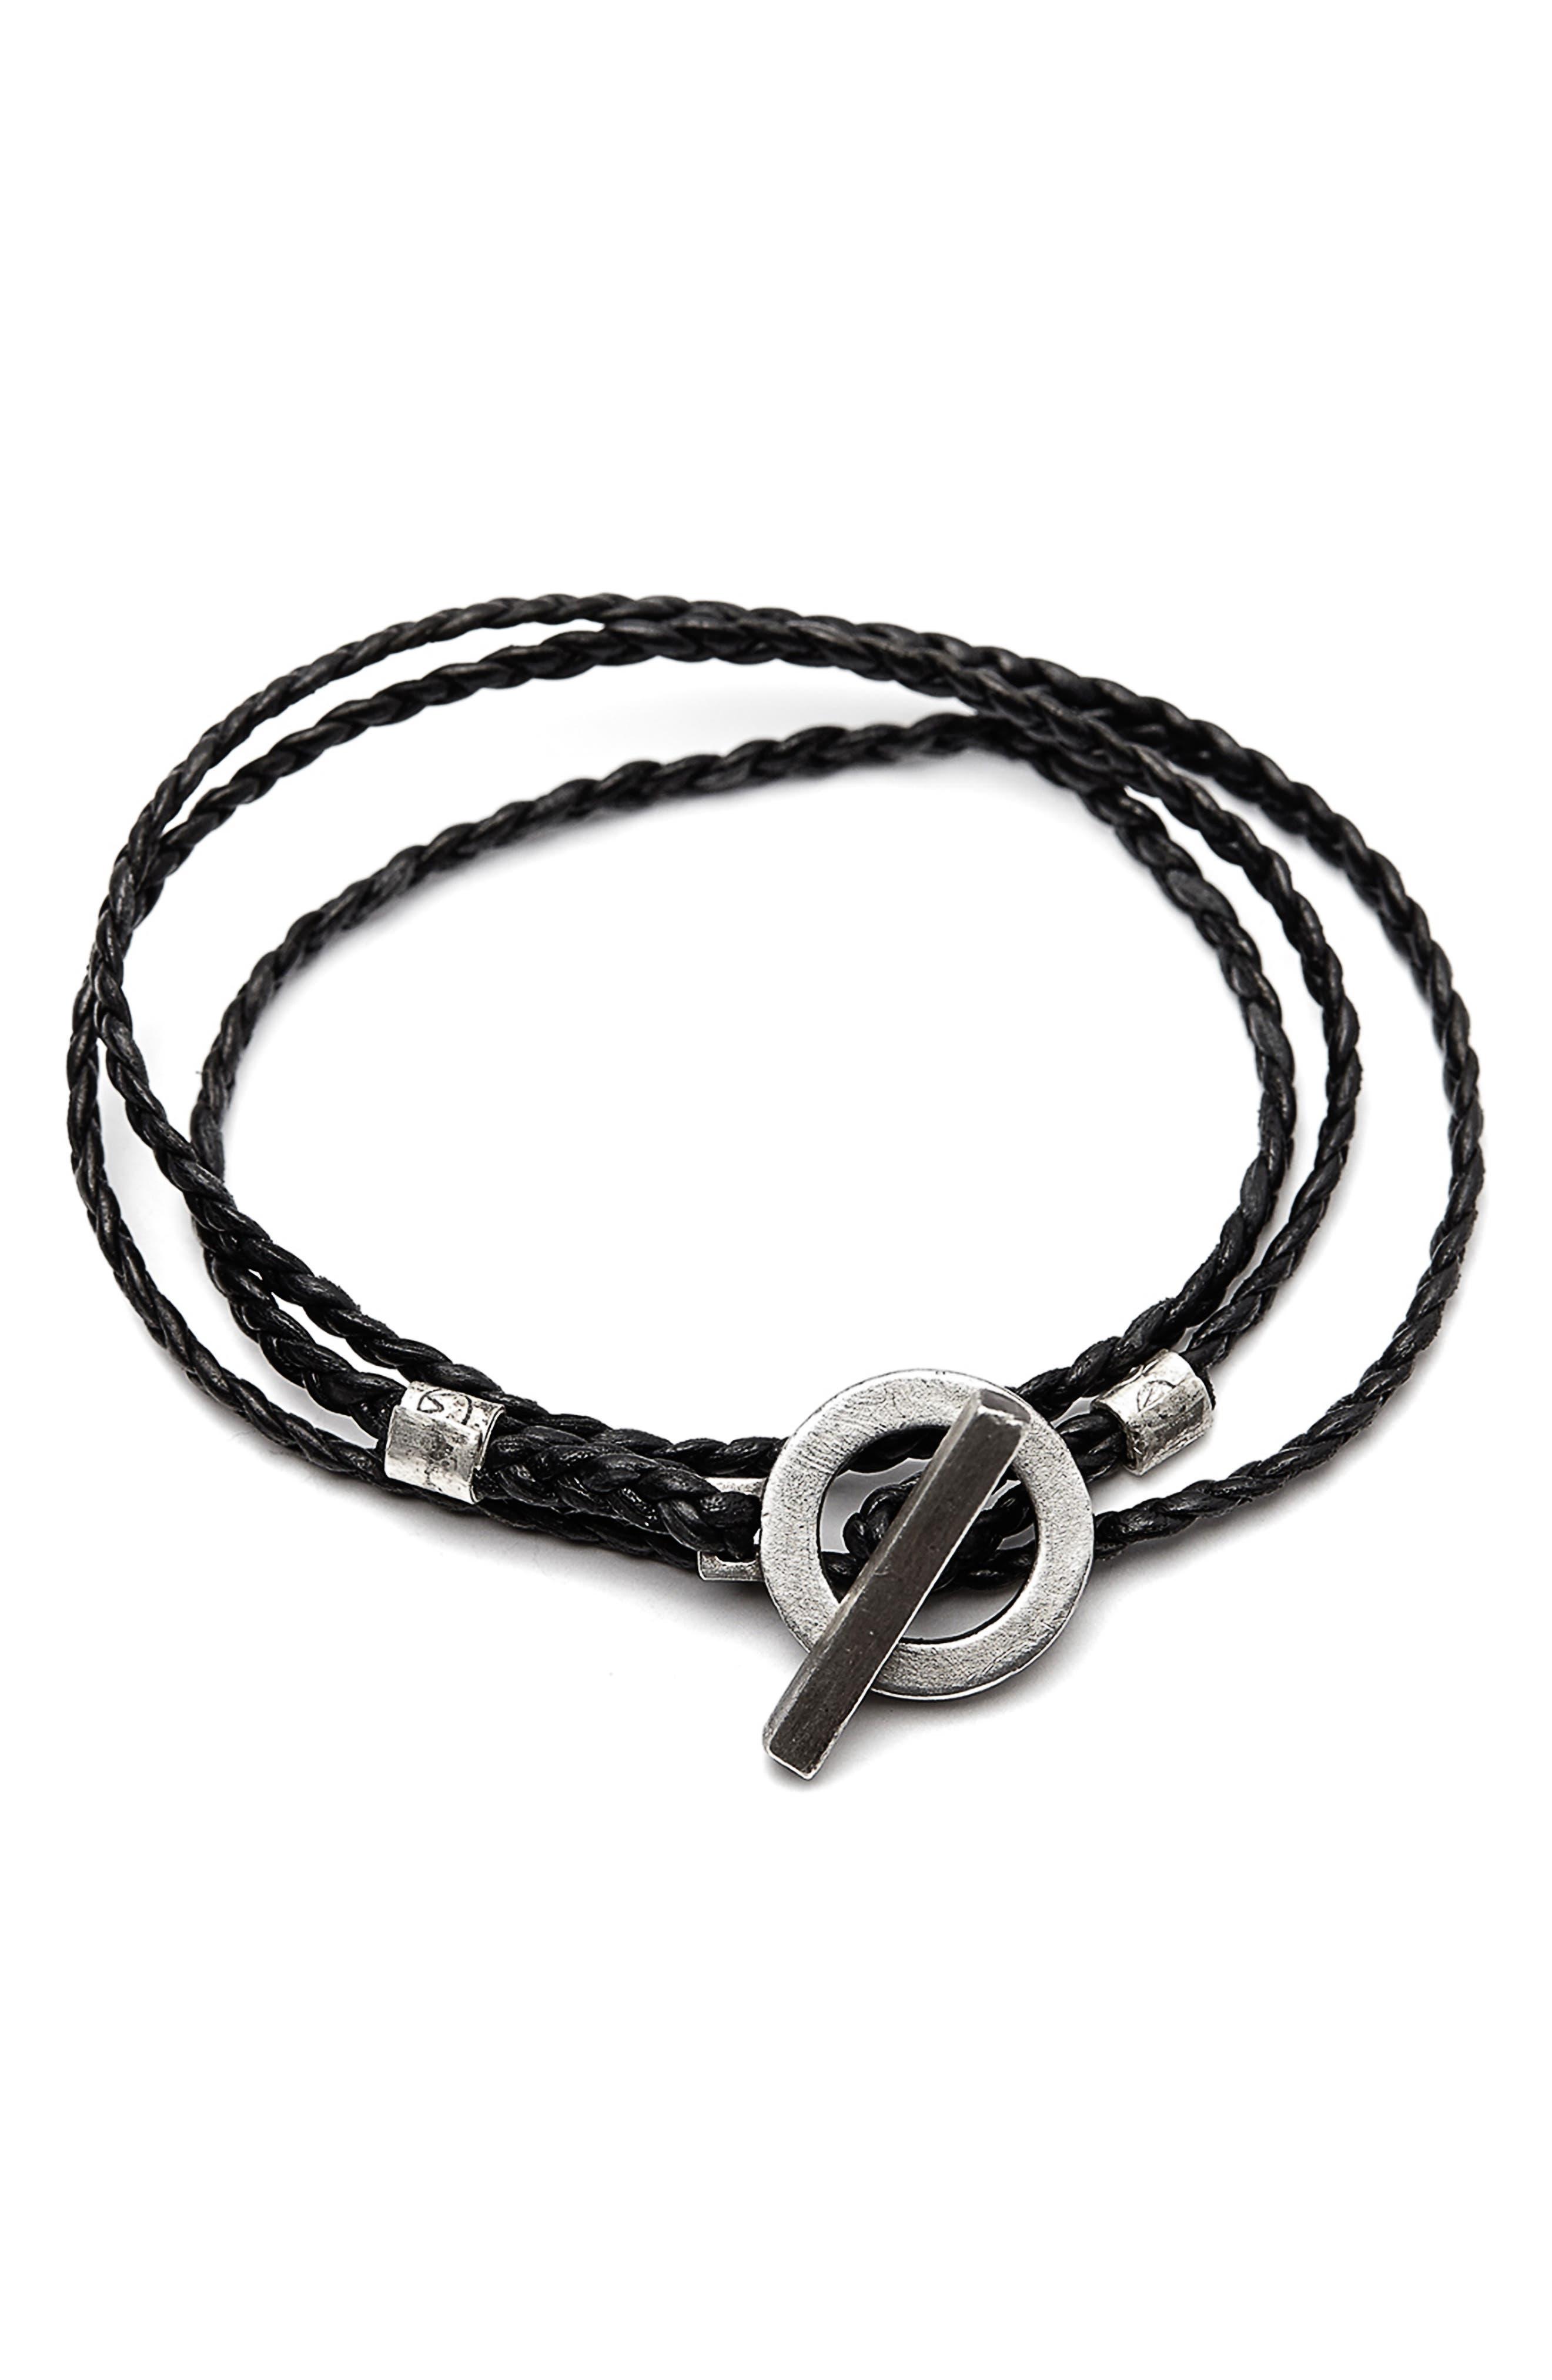 3-Wrap Braided Leather Bracelet,                             Main thumbnail 1, color,                             SILVER/BLACK